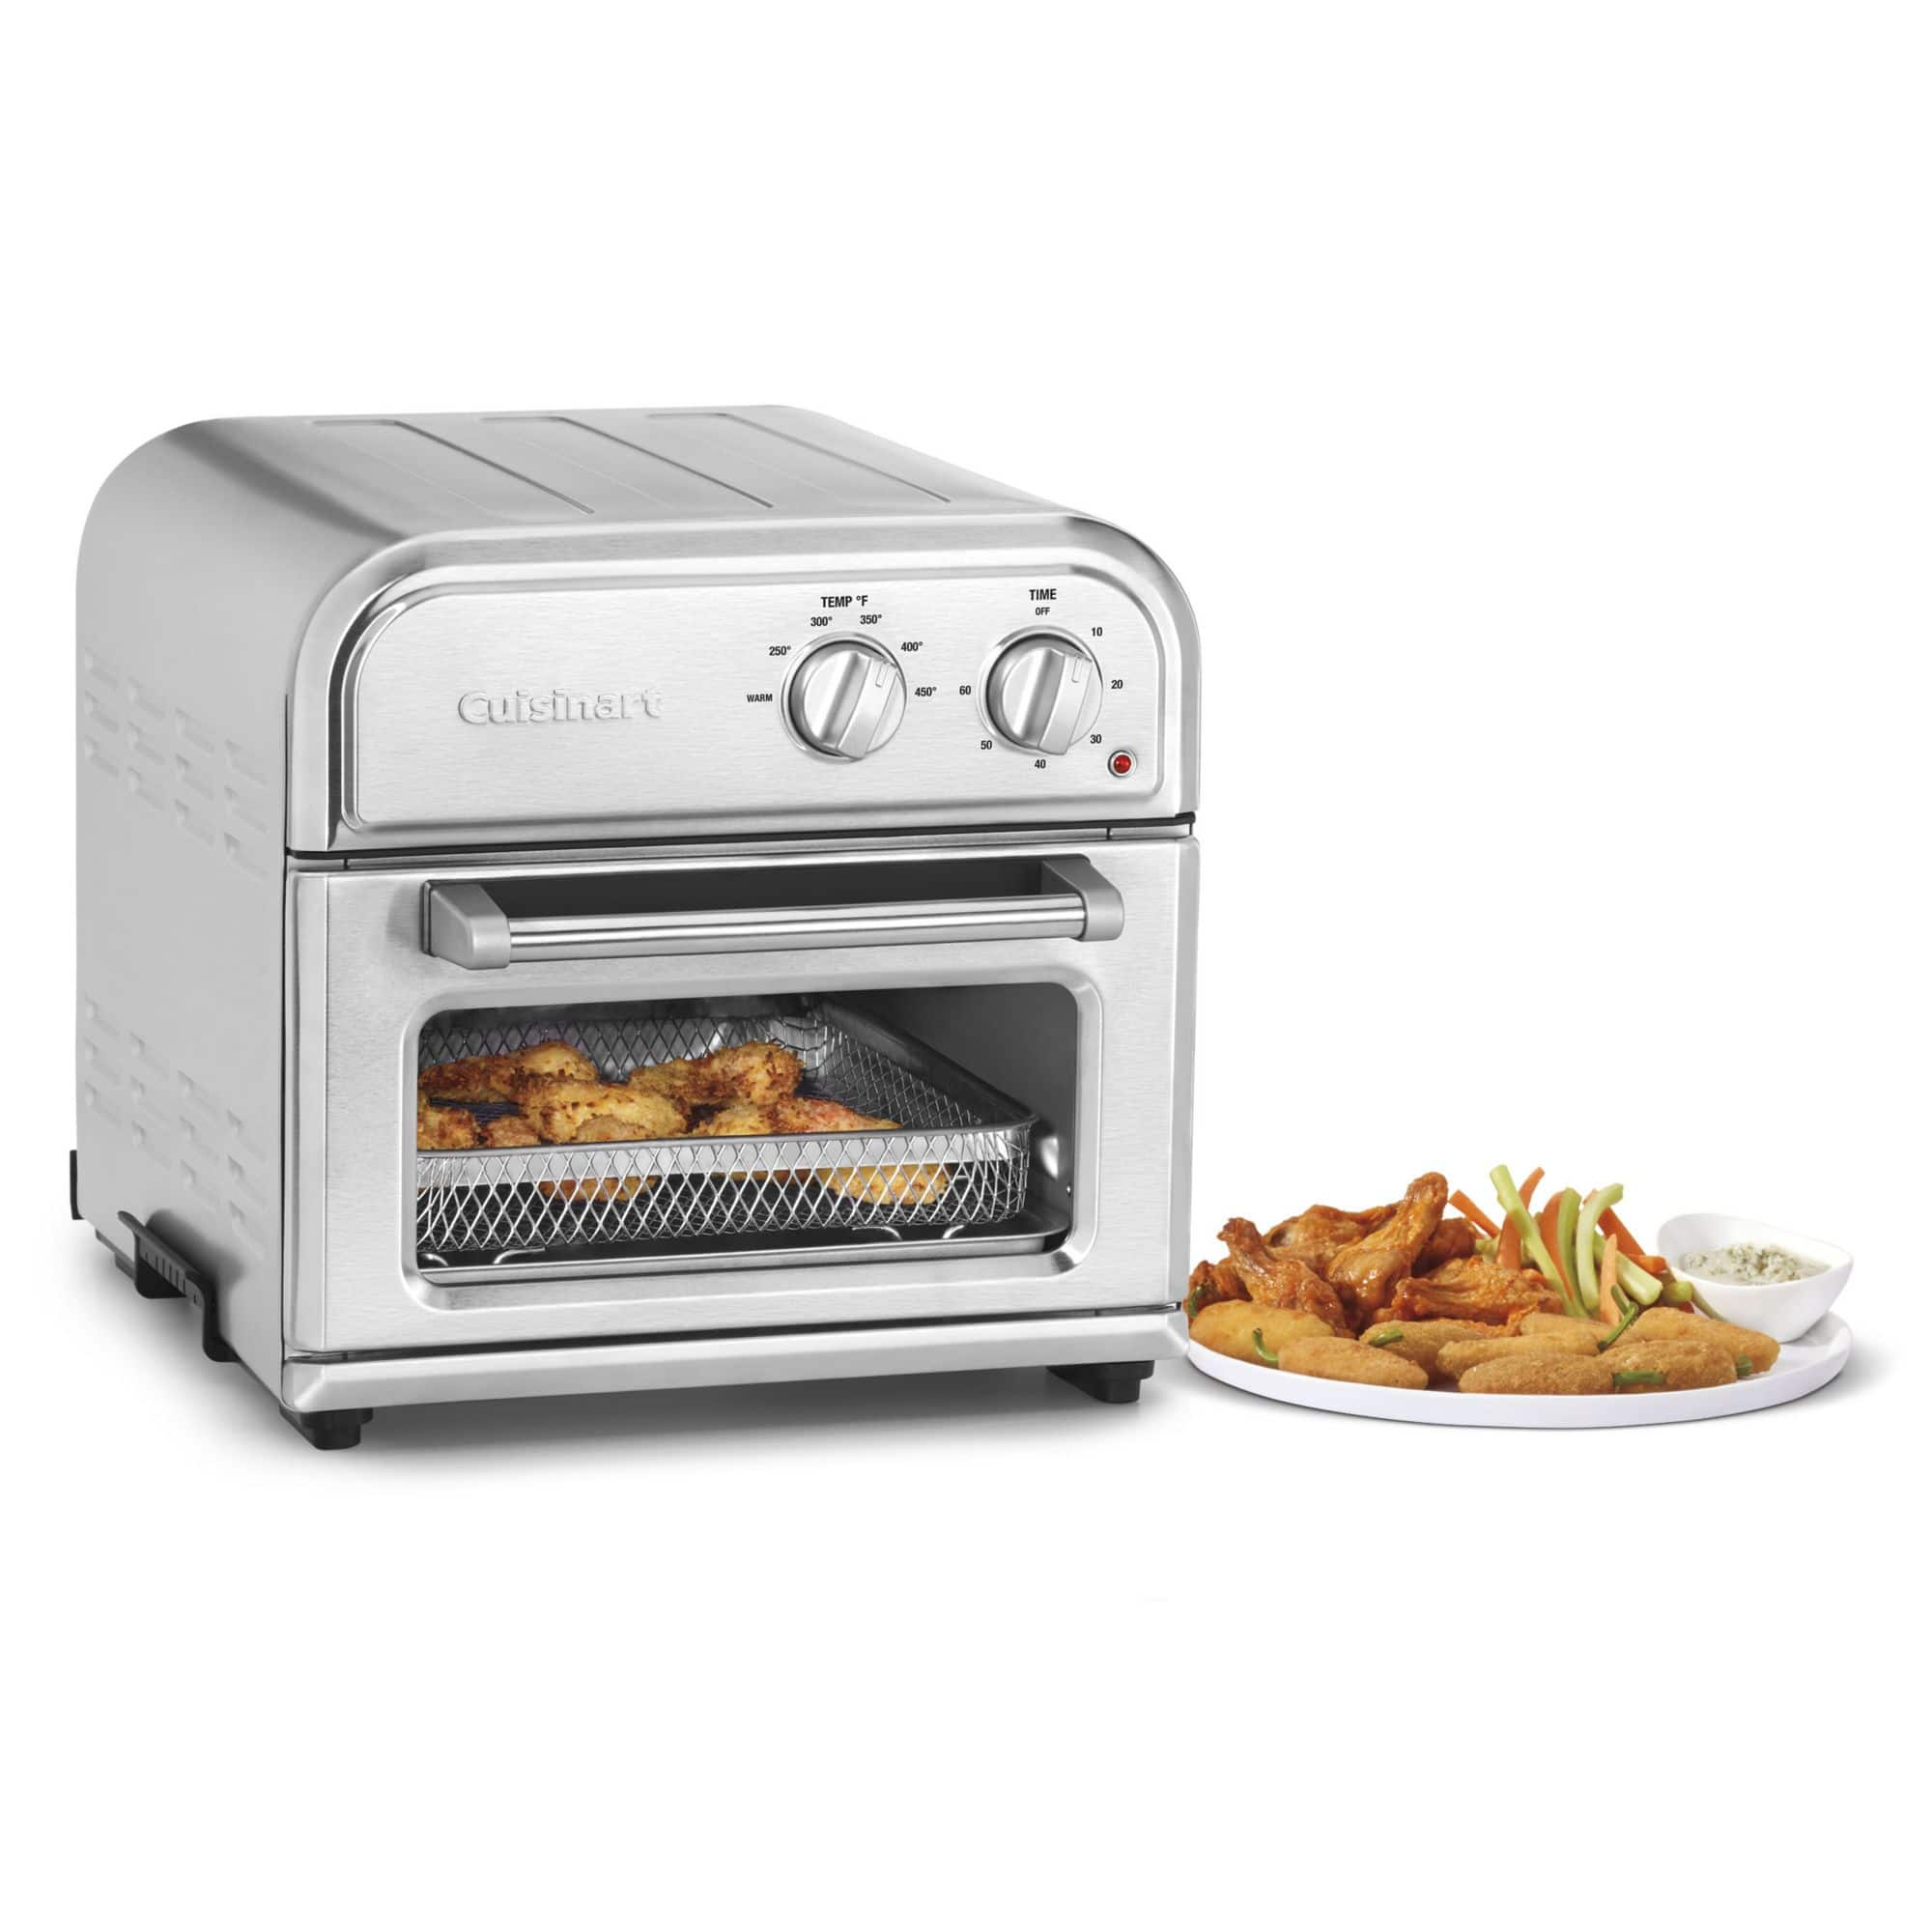 Cuisinart Air Fryer - Stainless Steel ($35 Off; Regular $99) - BJs In Club Only $64.99 YMMV